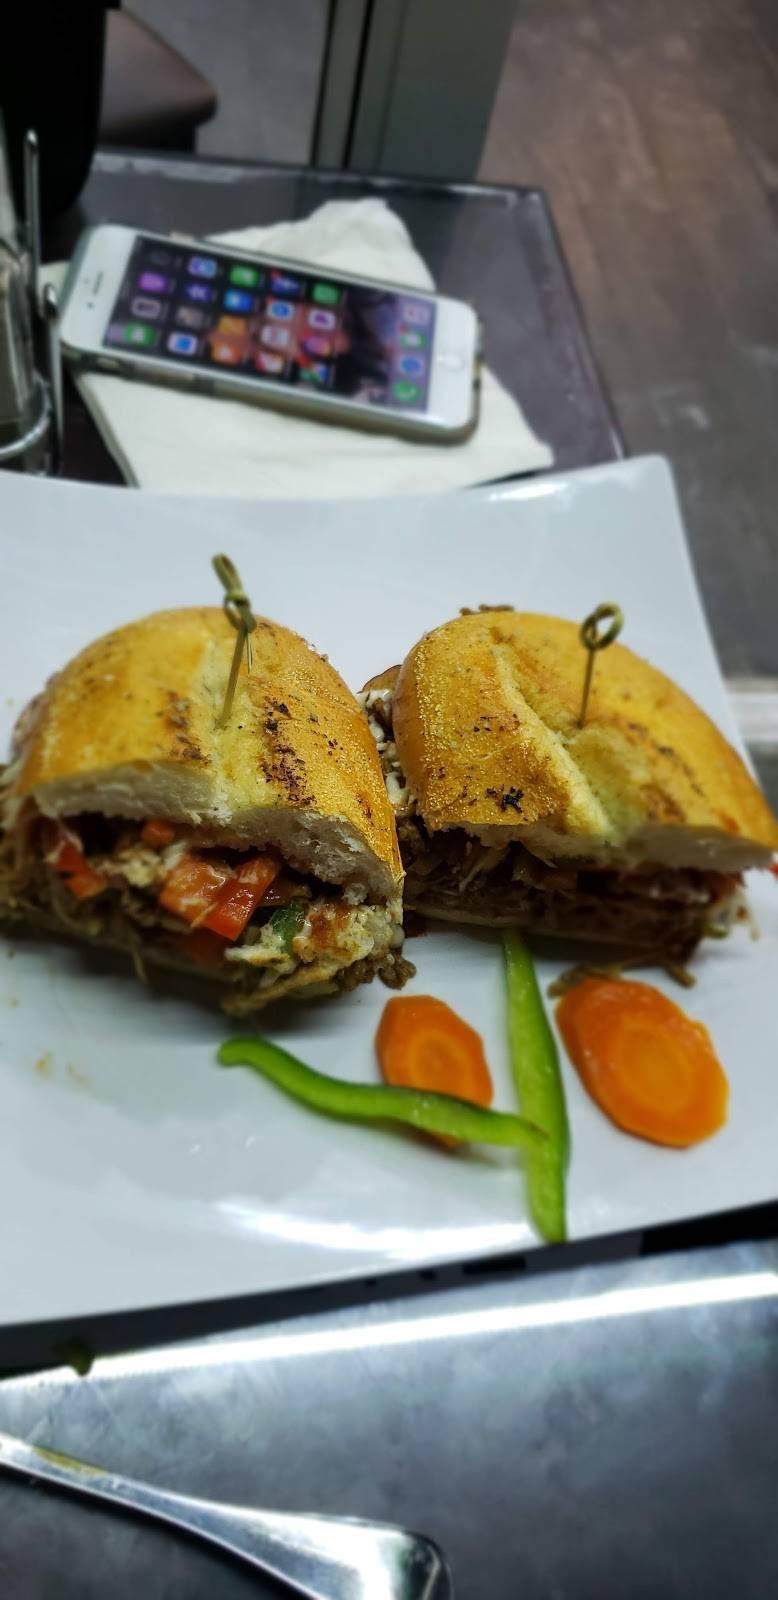 Cane Natural | restaurant | 52a Sherman Ave, New York, NY 10040, USA | 6465901599 OR +1 646-590-1599